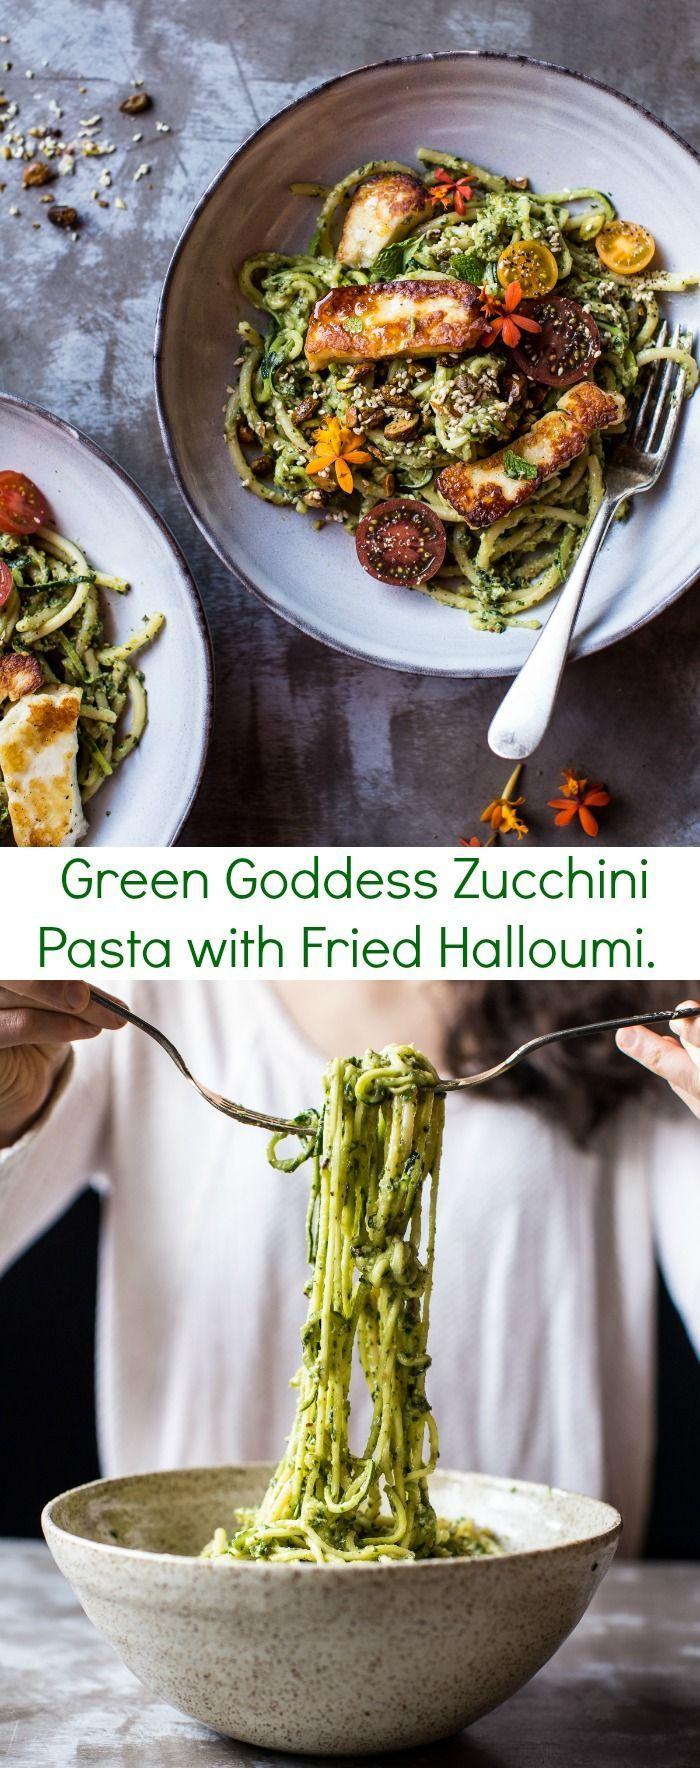 "Green Goddess Zucchini Pasta with Fried Halloumi   <a href="""" rel=""nofollow"" target=""_blank""></a> <a href=""/hbharvest/"" title=""Half Baked Harvest"">@Half Baked Harvest</a>"